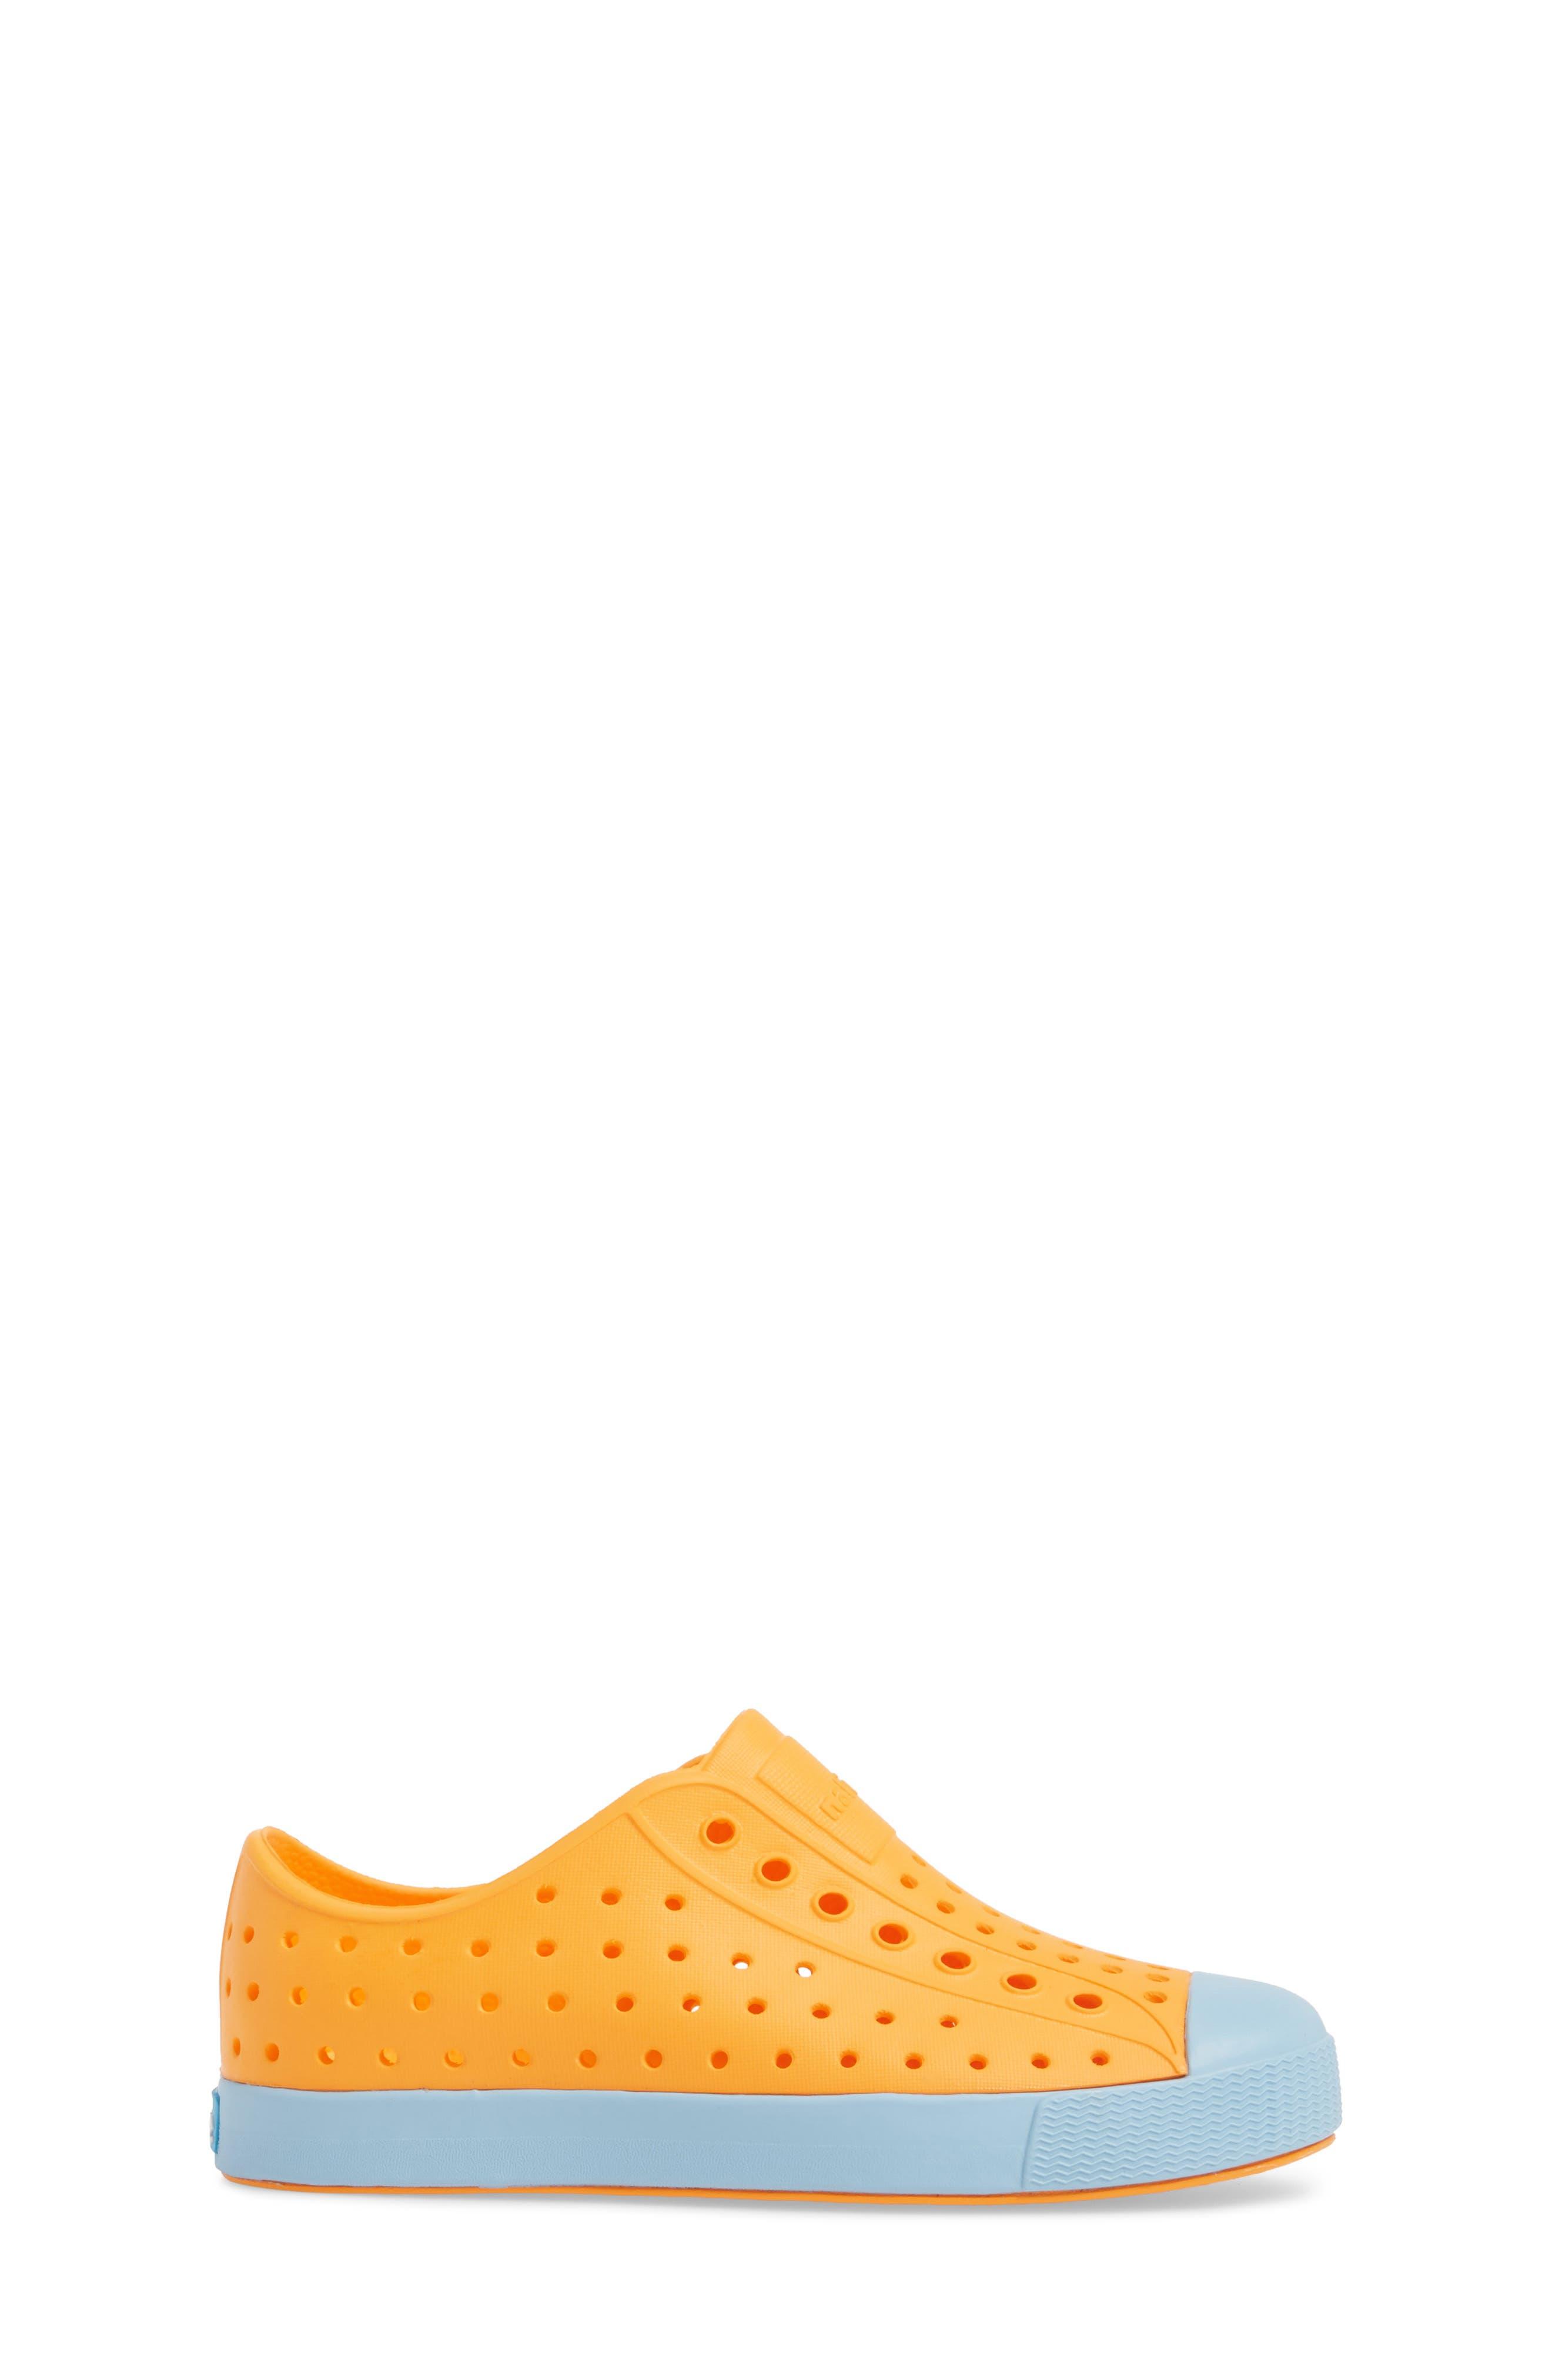 'Jefferson' Water Friendly Slip-On Sneaker,                             Alternate thumbnail 135, color,